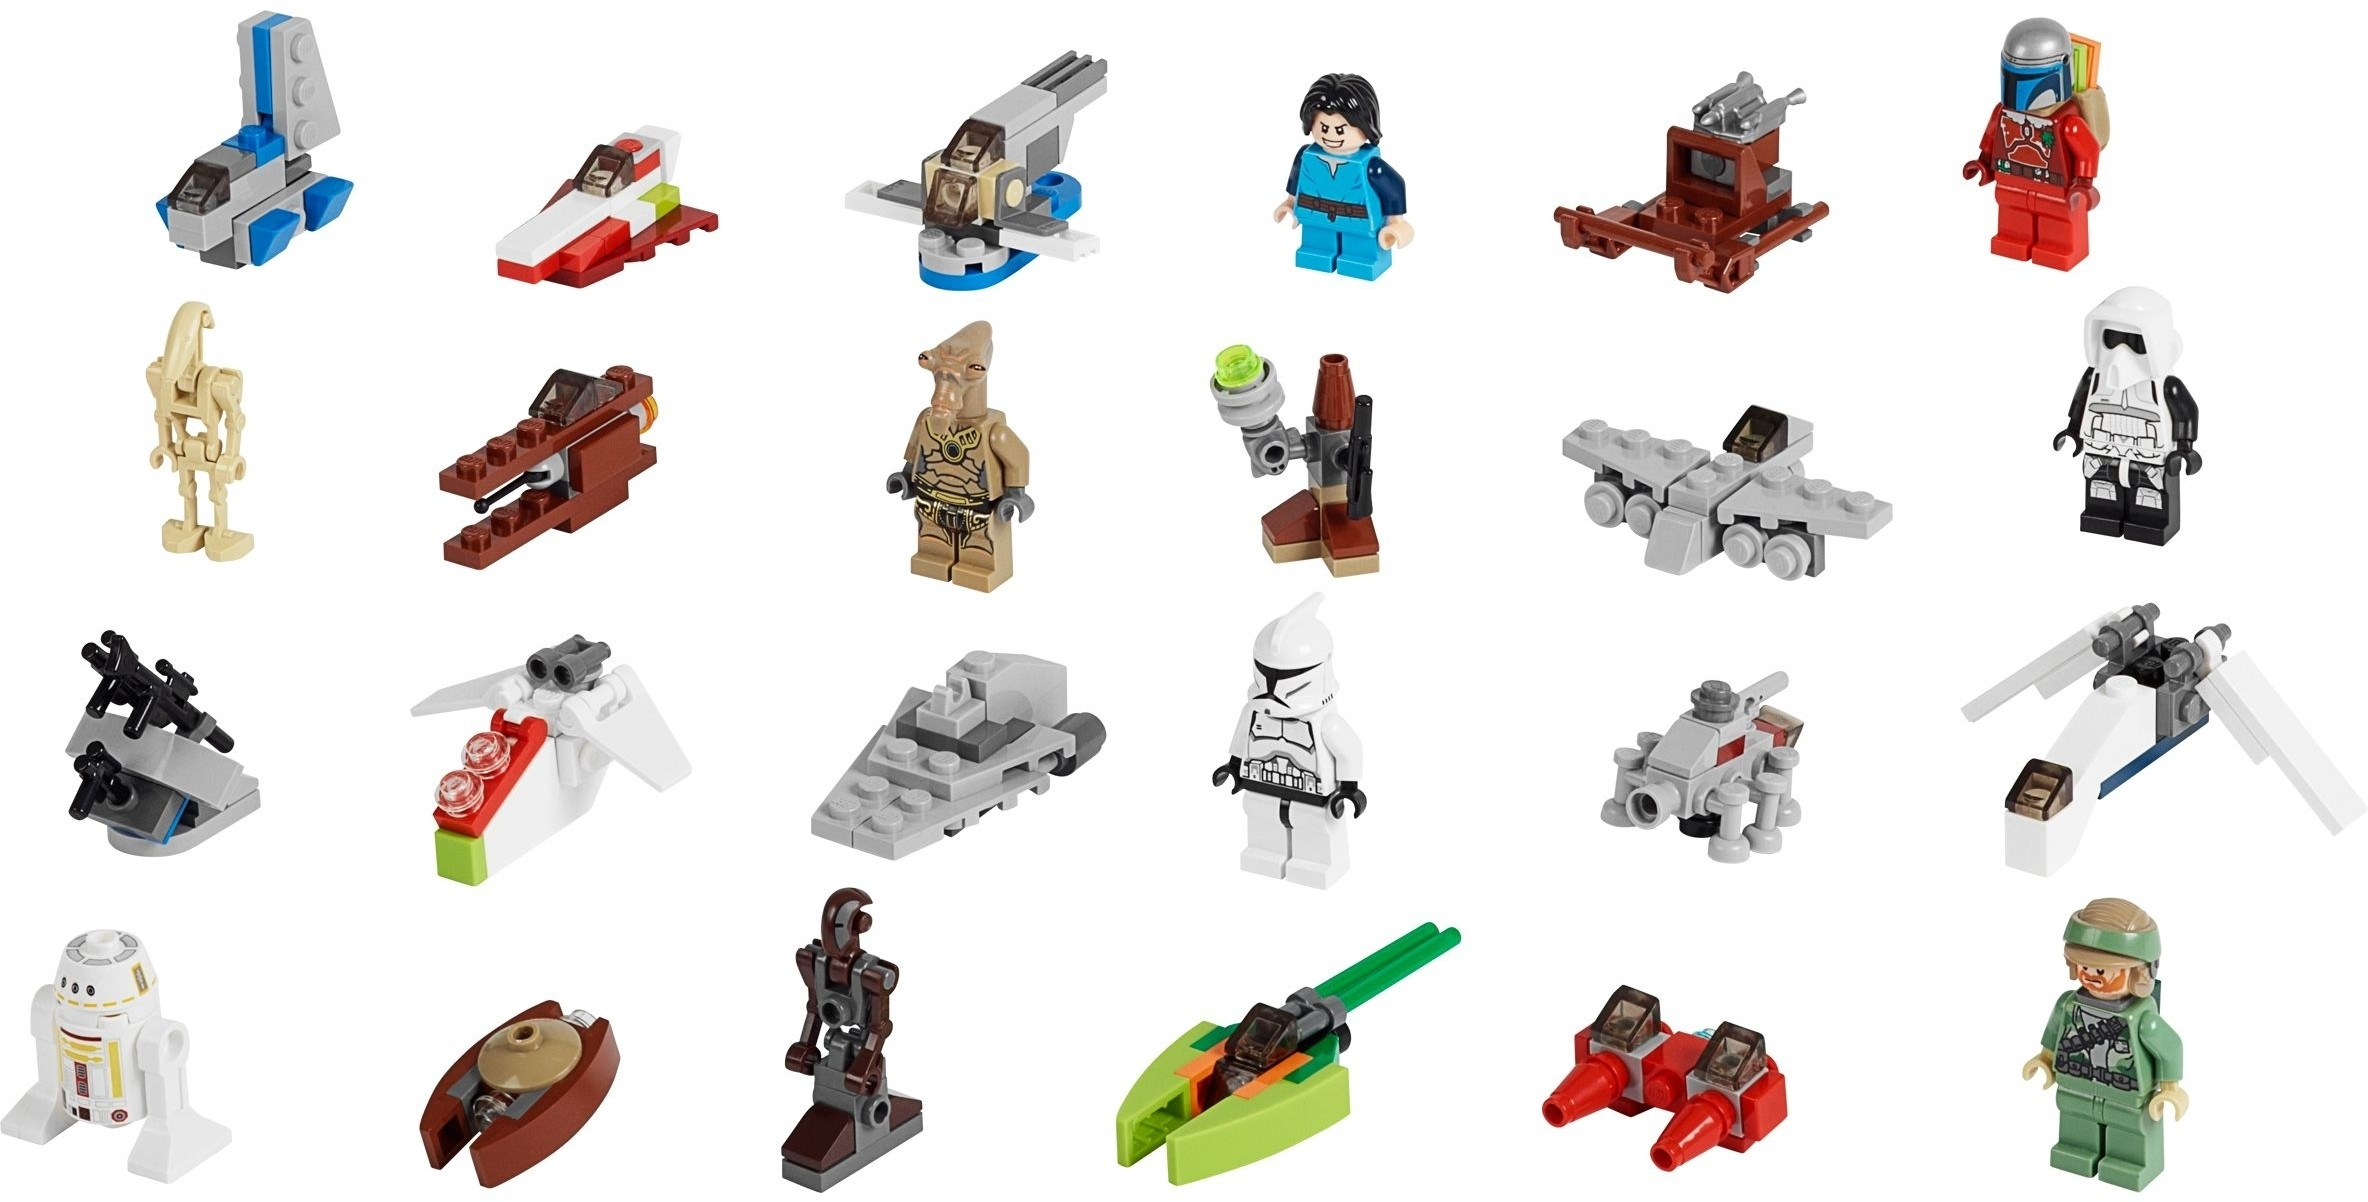 Lego 75023 Star Wars Advent Calendar Instructions, Star Wars throughout Lego Advent Calendar Star Wars Directions